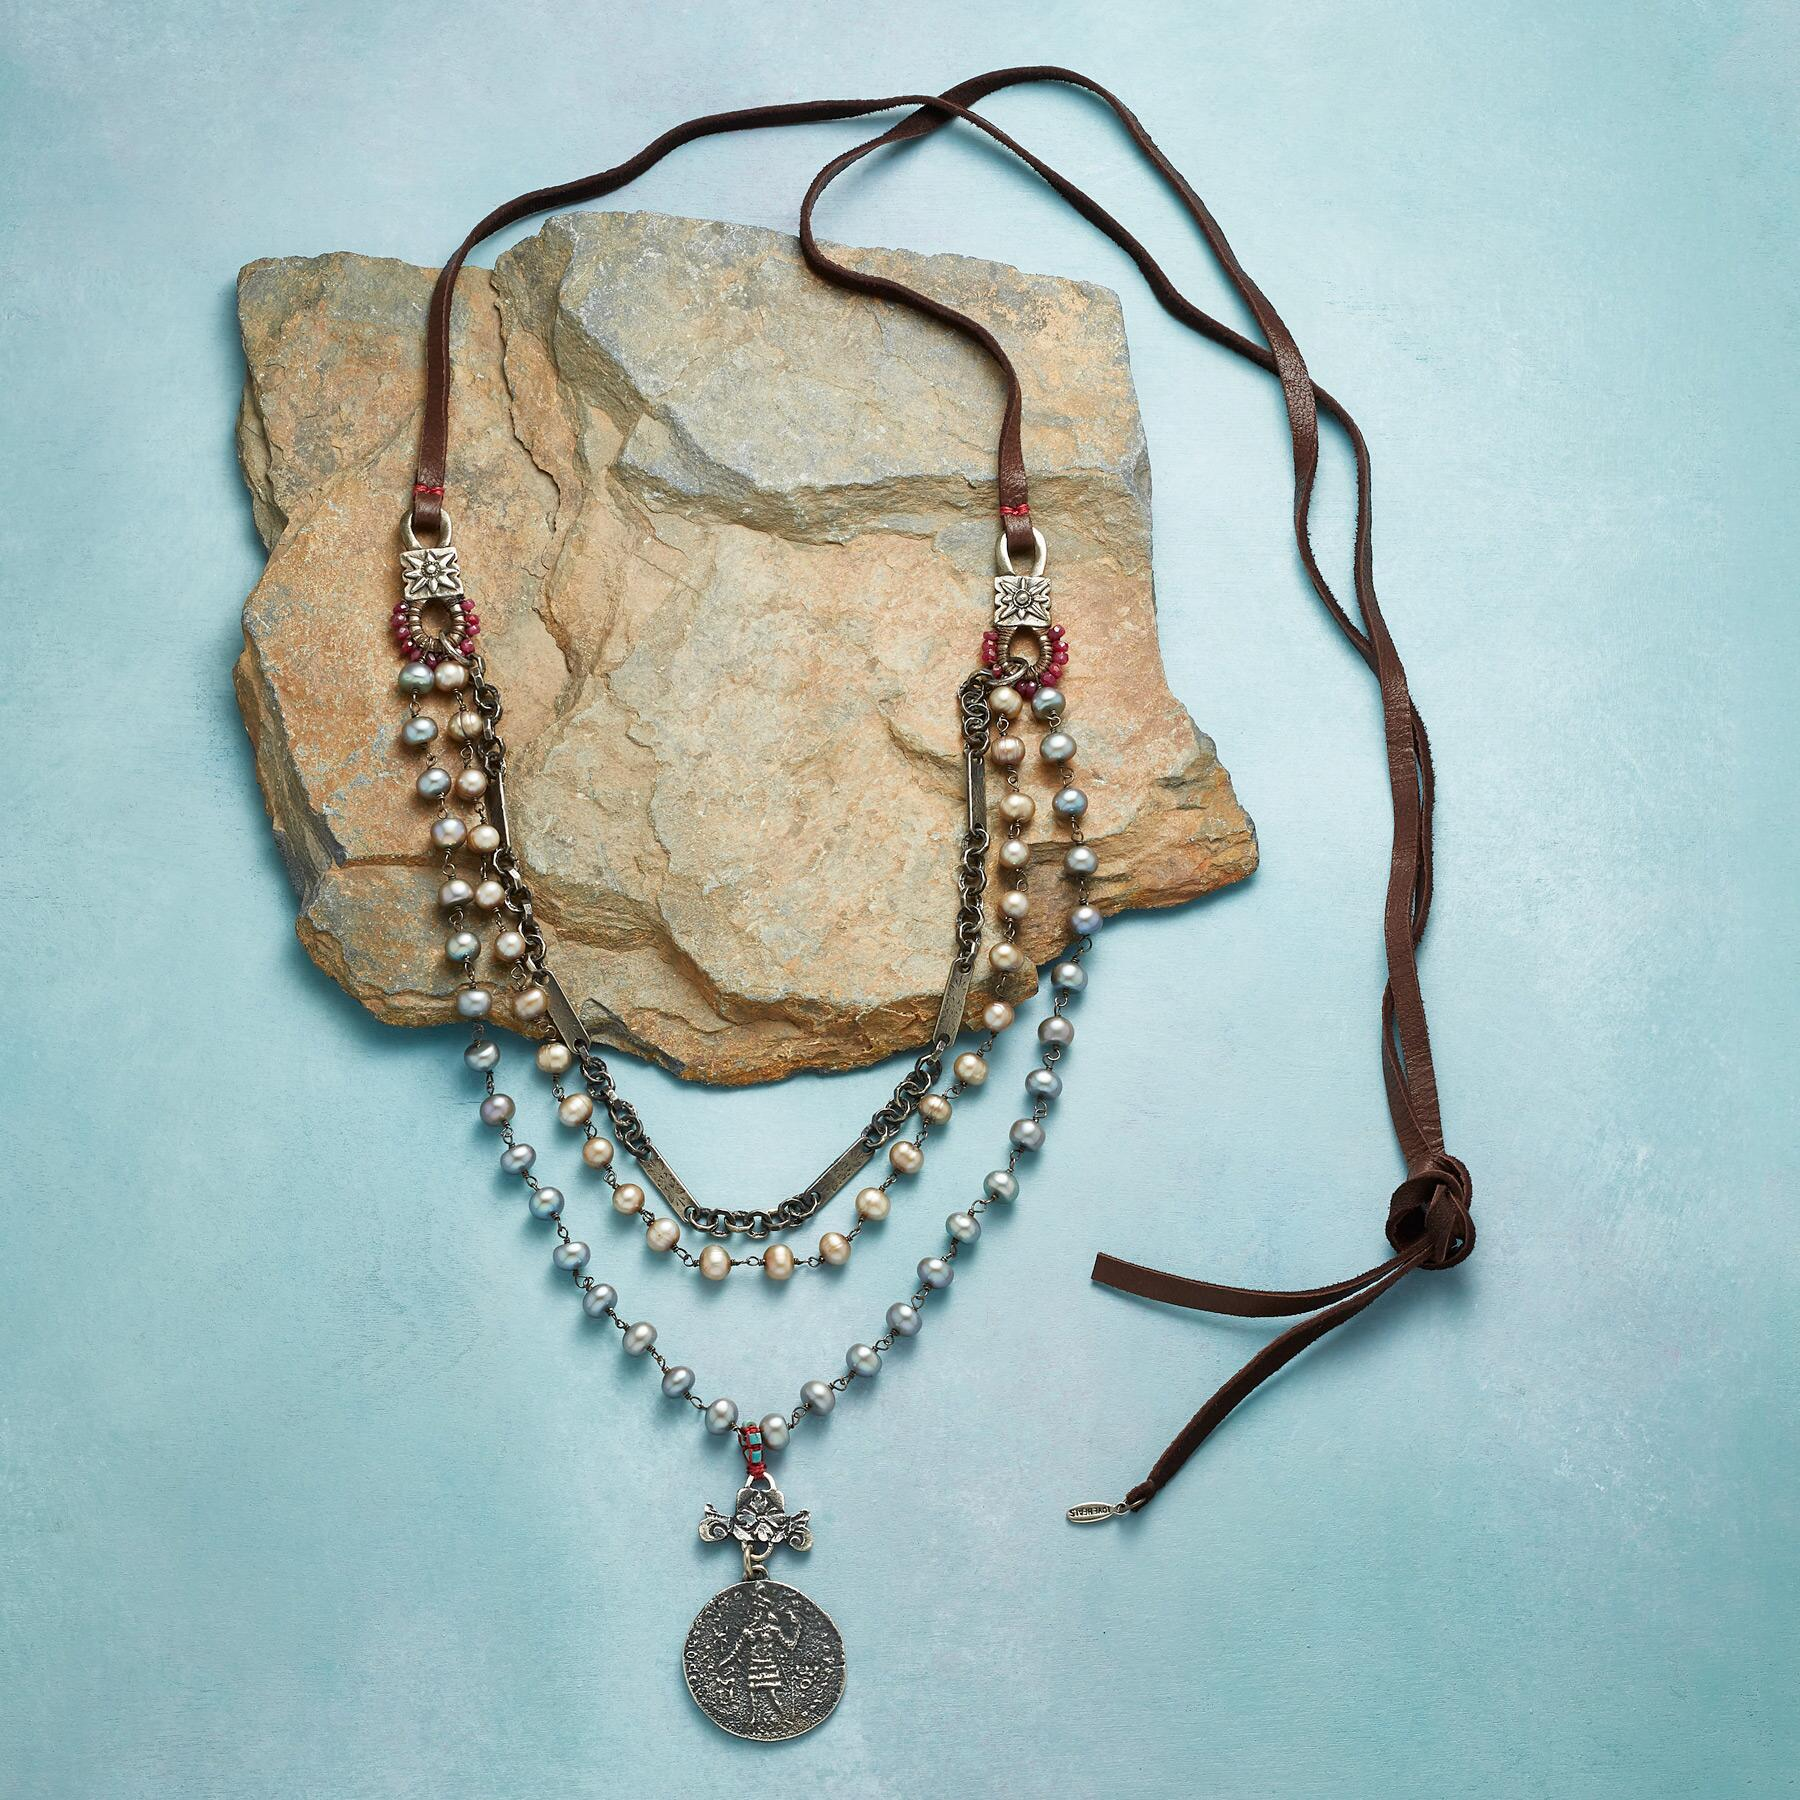 ANCIENT WISDOM NECKLACE: View 2